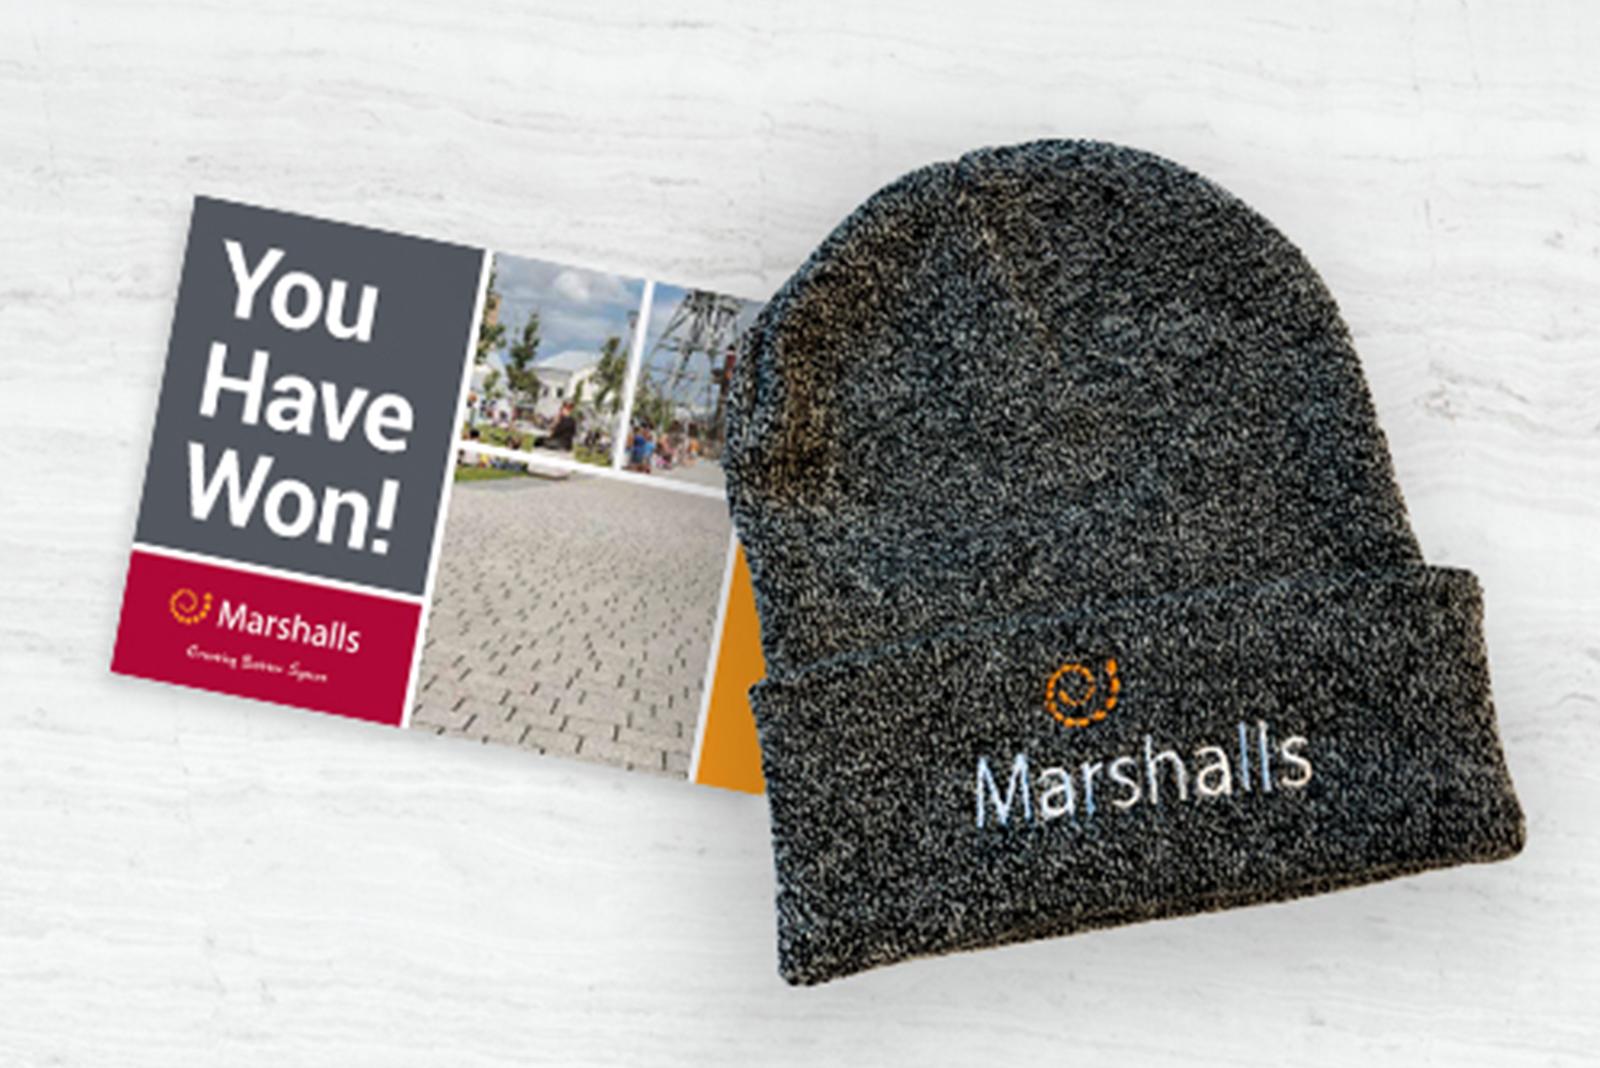 Win a Marshalls beanie hat